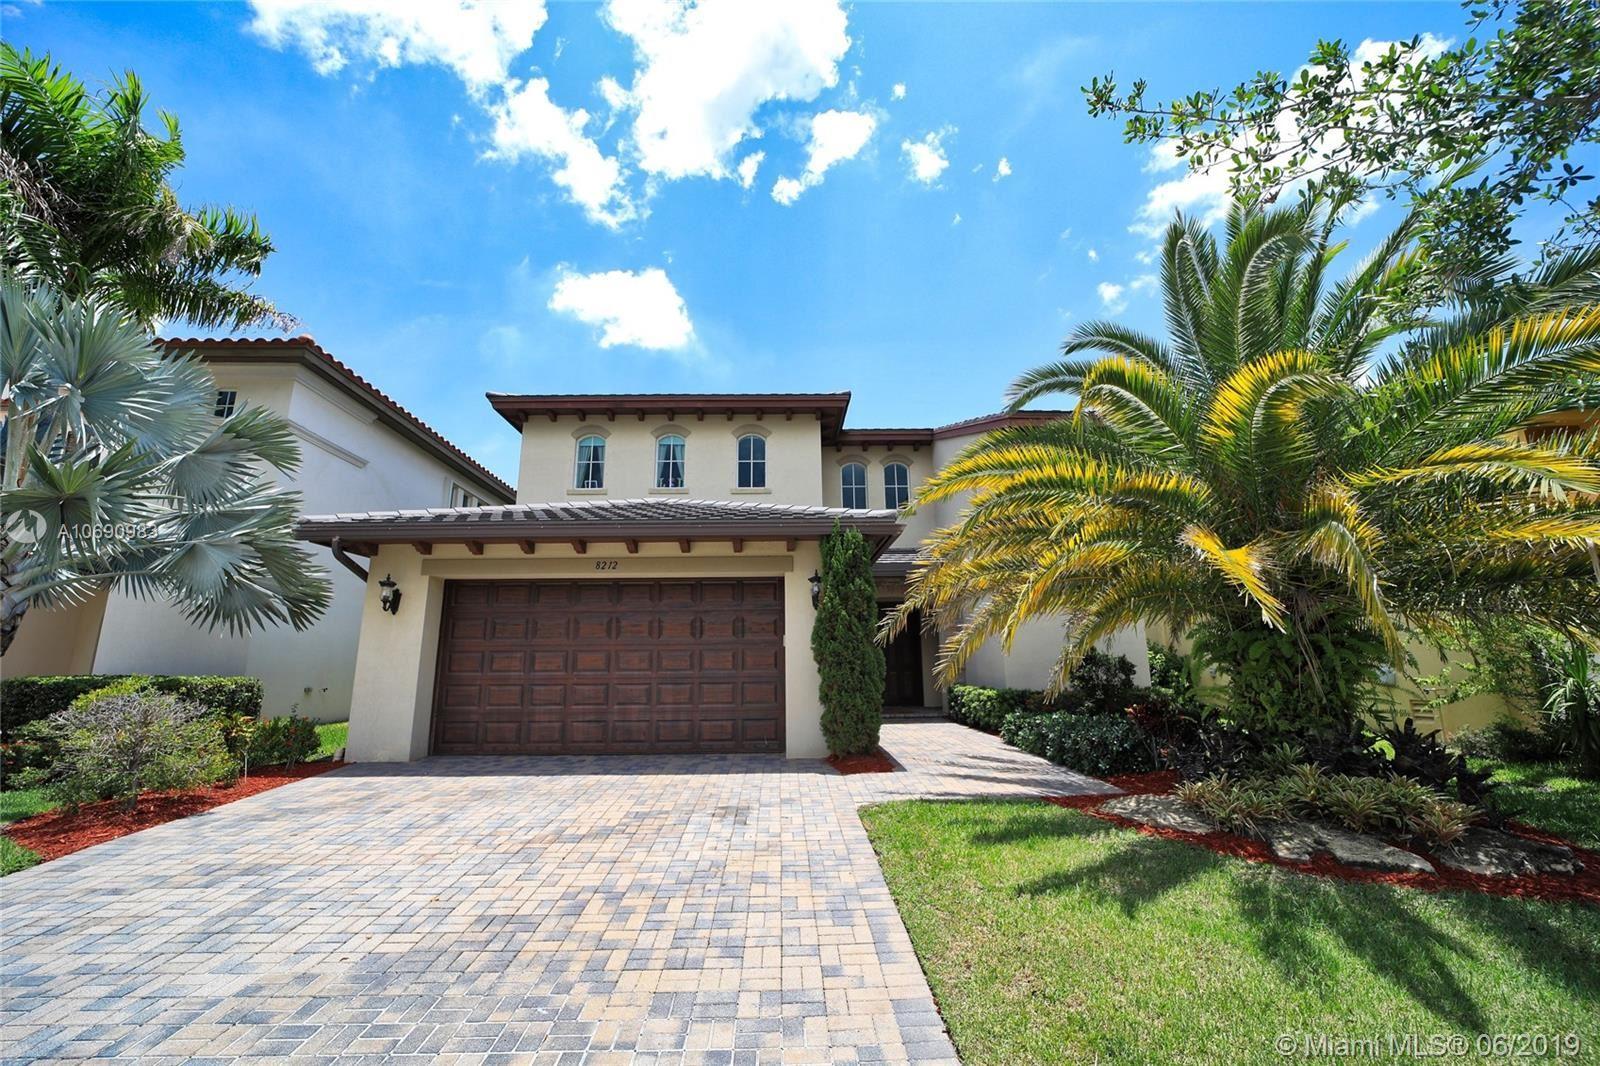 8212 NW 125th Ln, Parkland, FL 33076 - #: A10690983